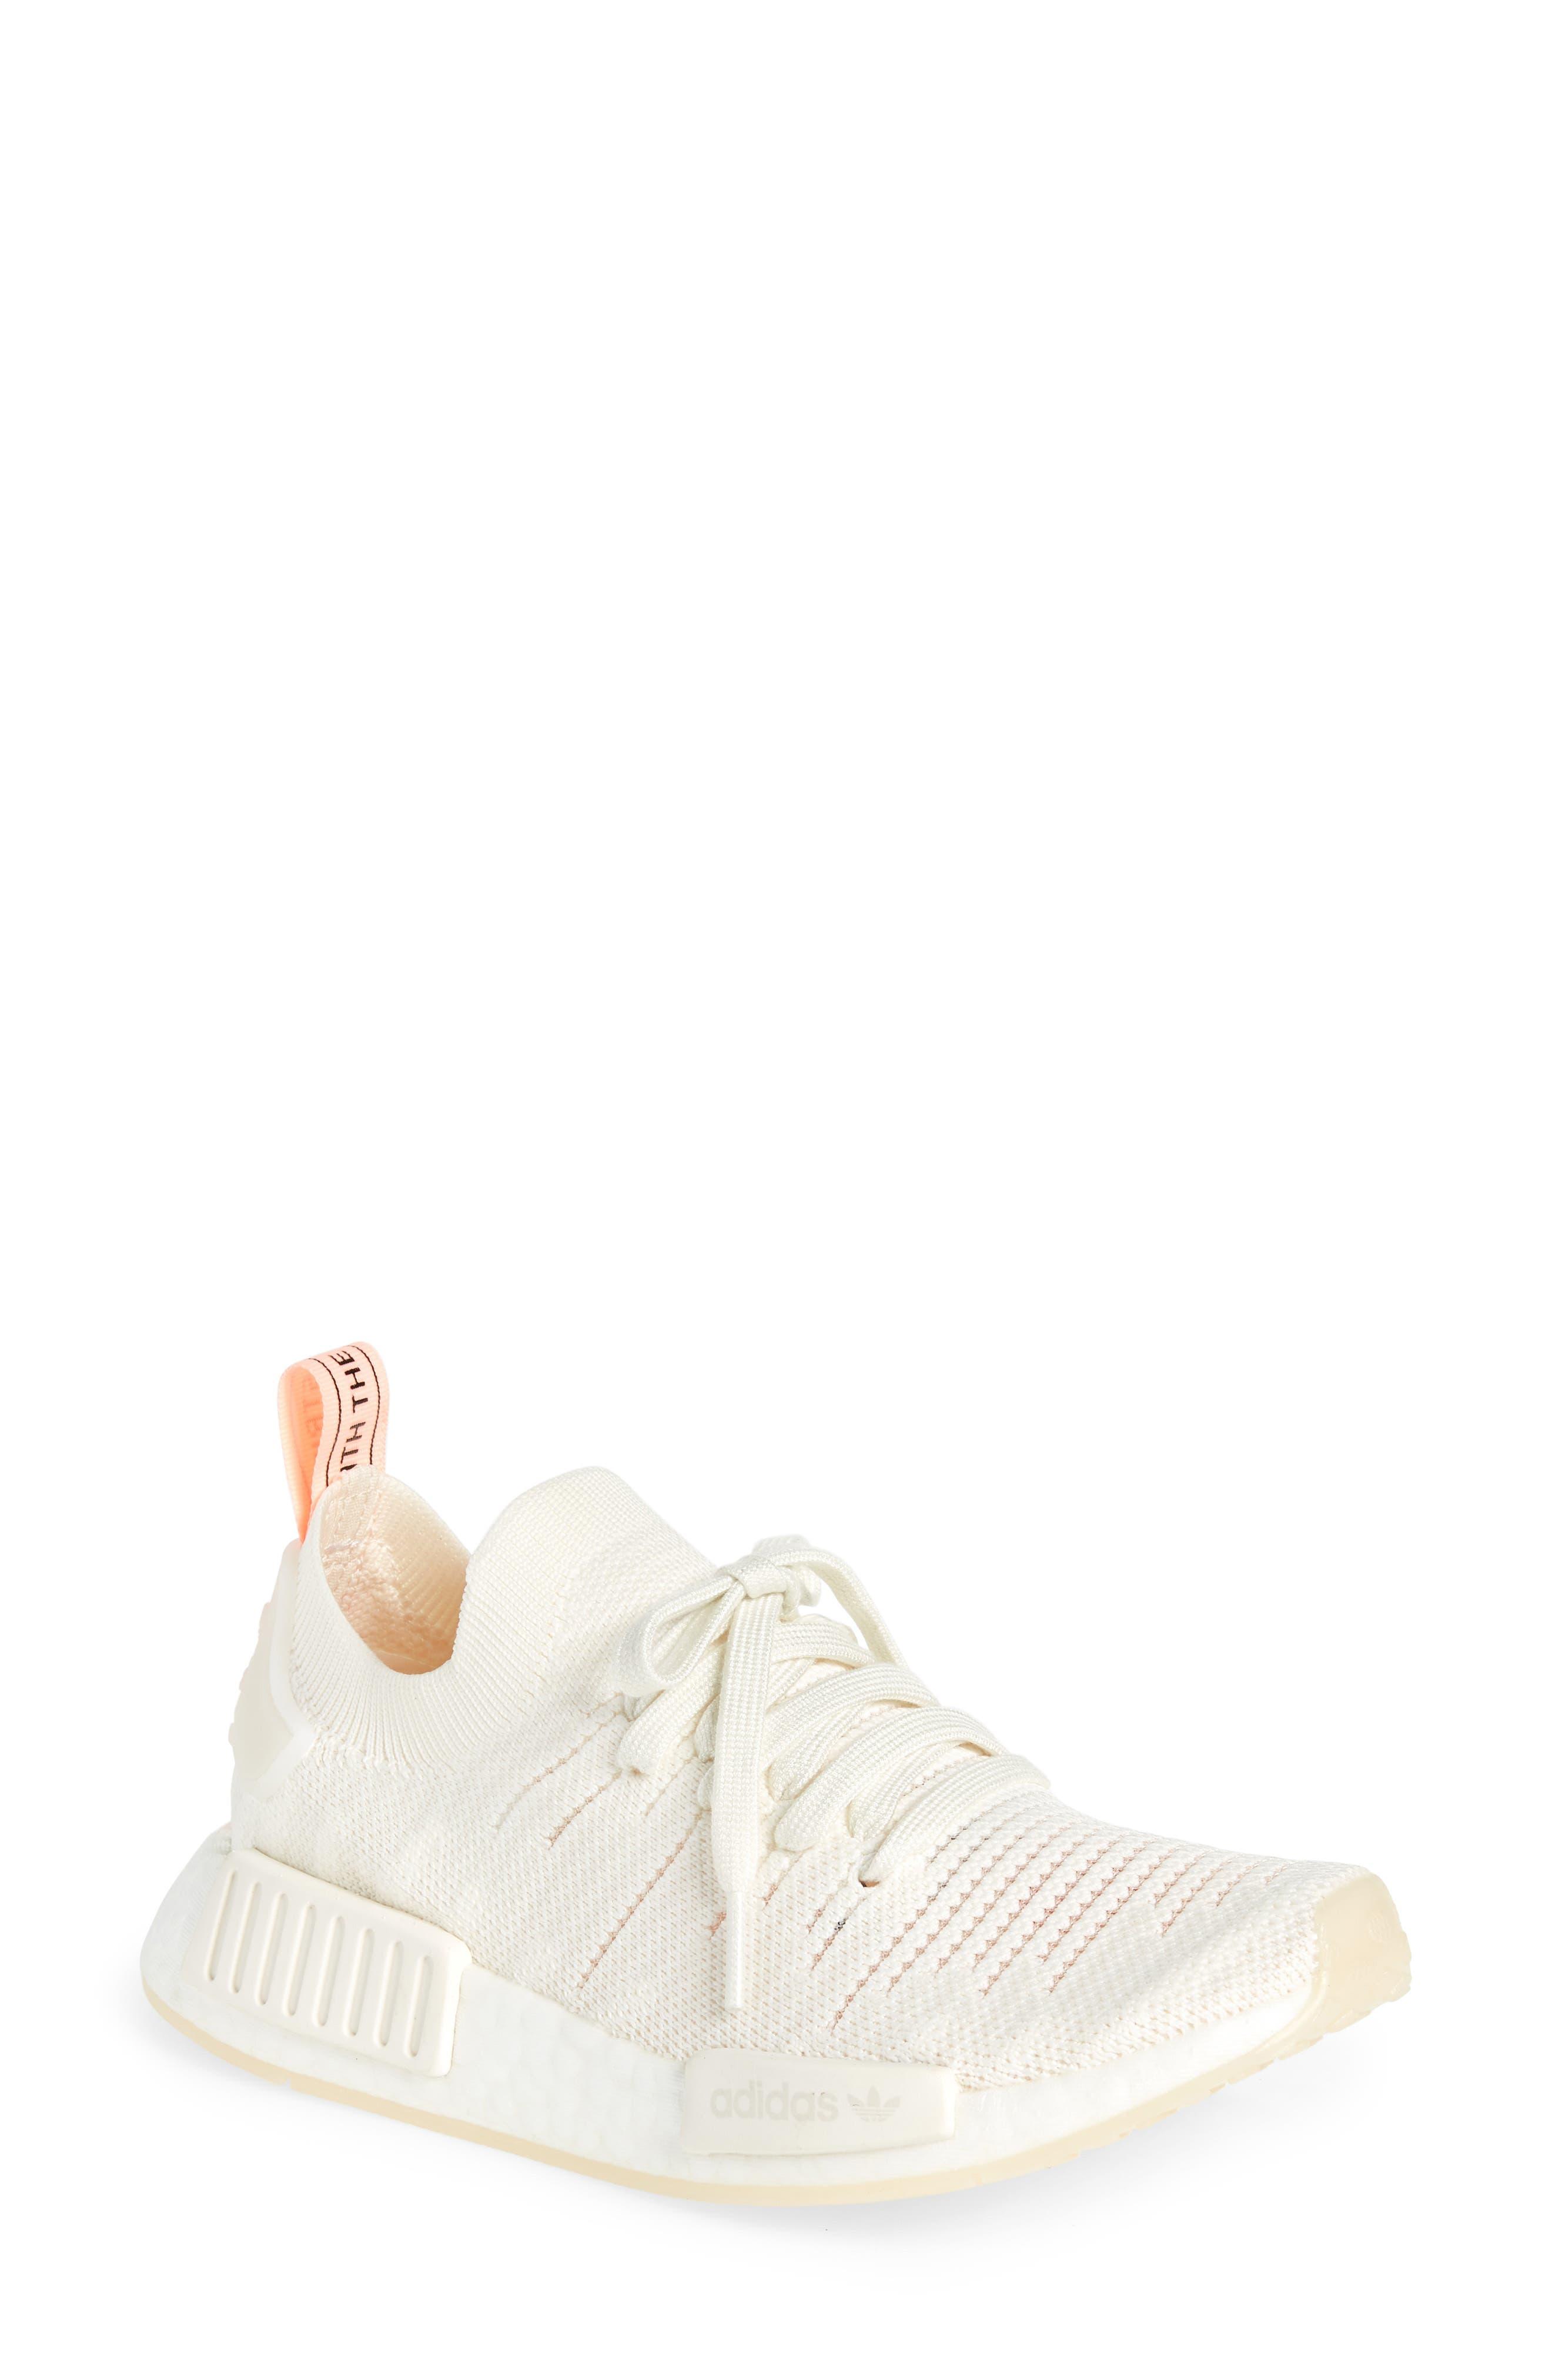 NMD R1 STLT Primeknit Sneaker,                             Main thumbnail 1, color,                             100